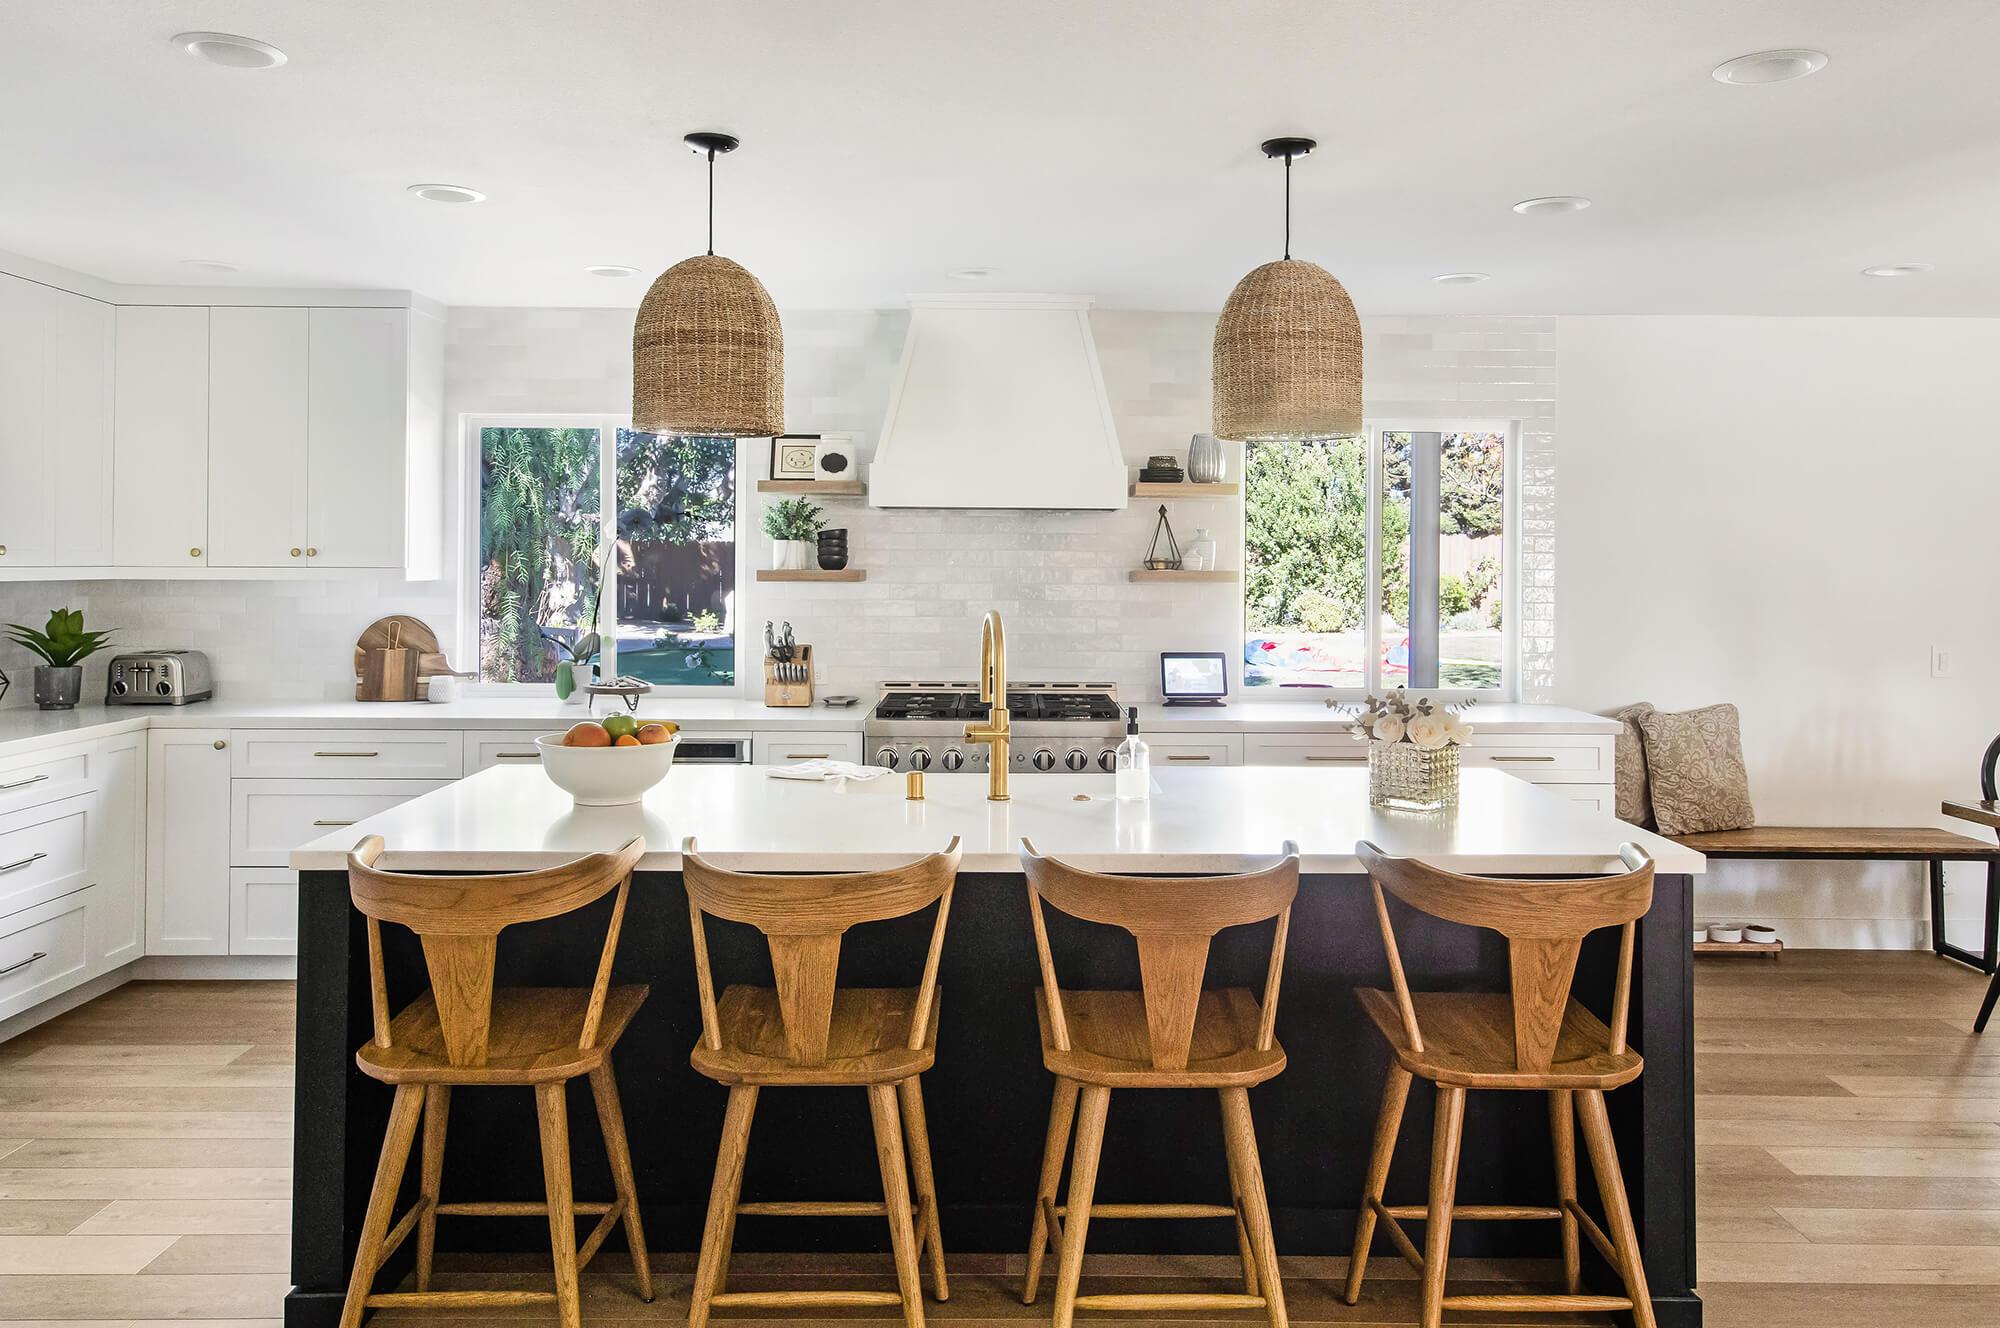 Black-and-gold-kitchen-design